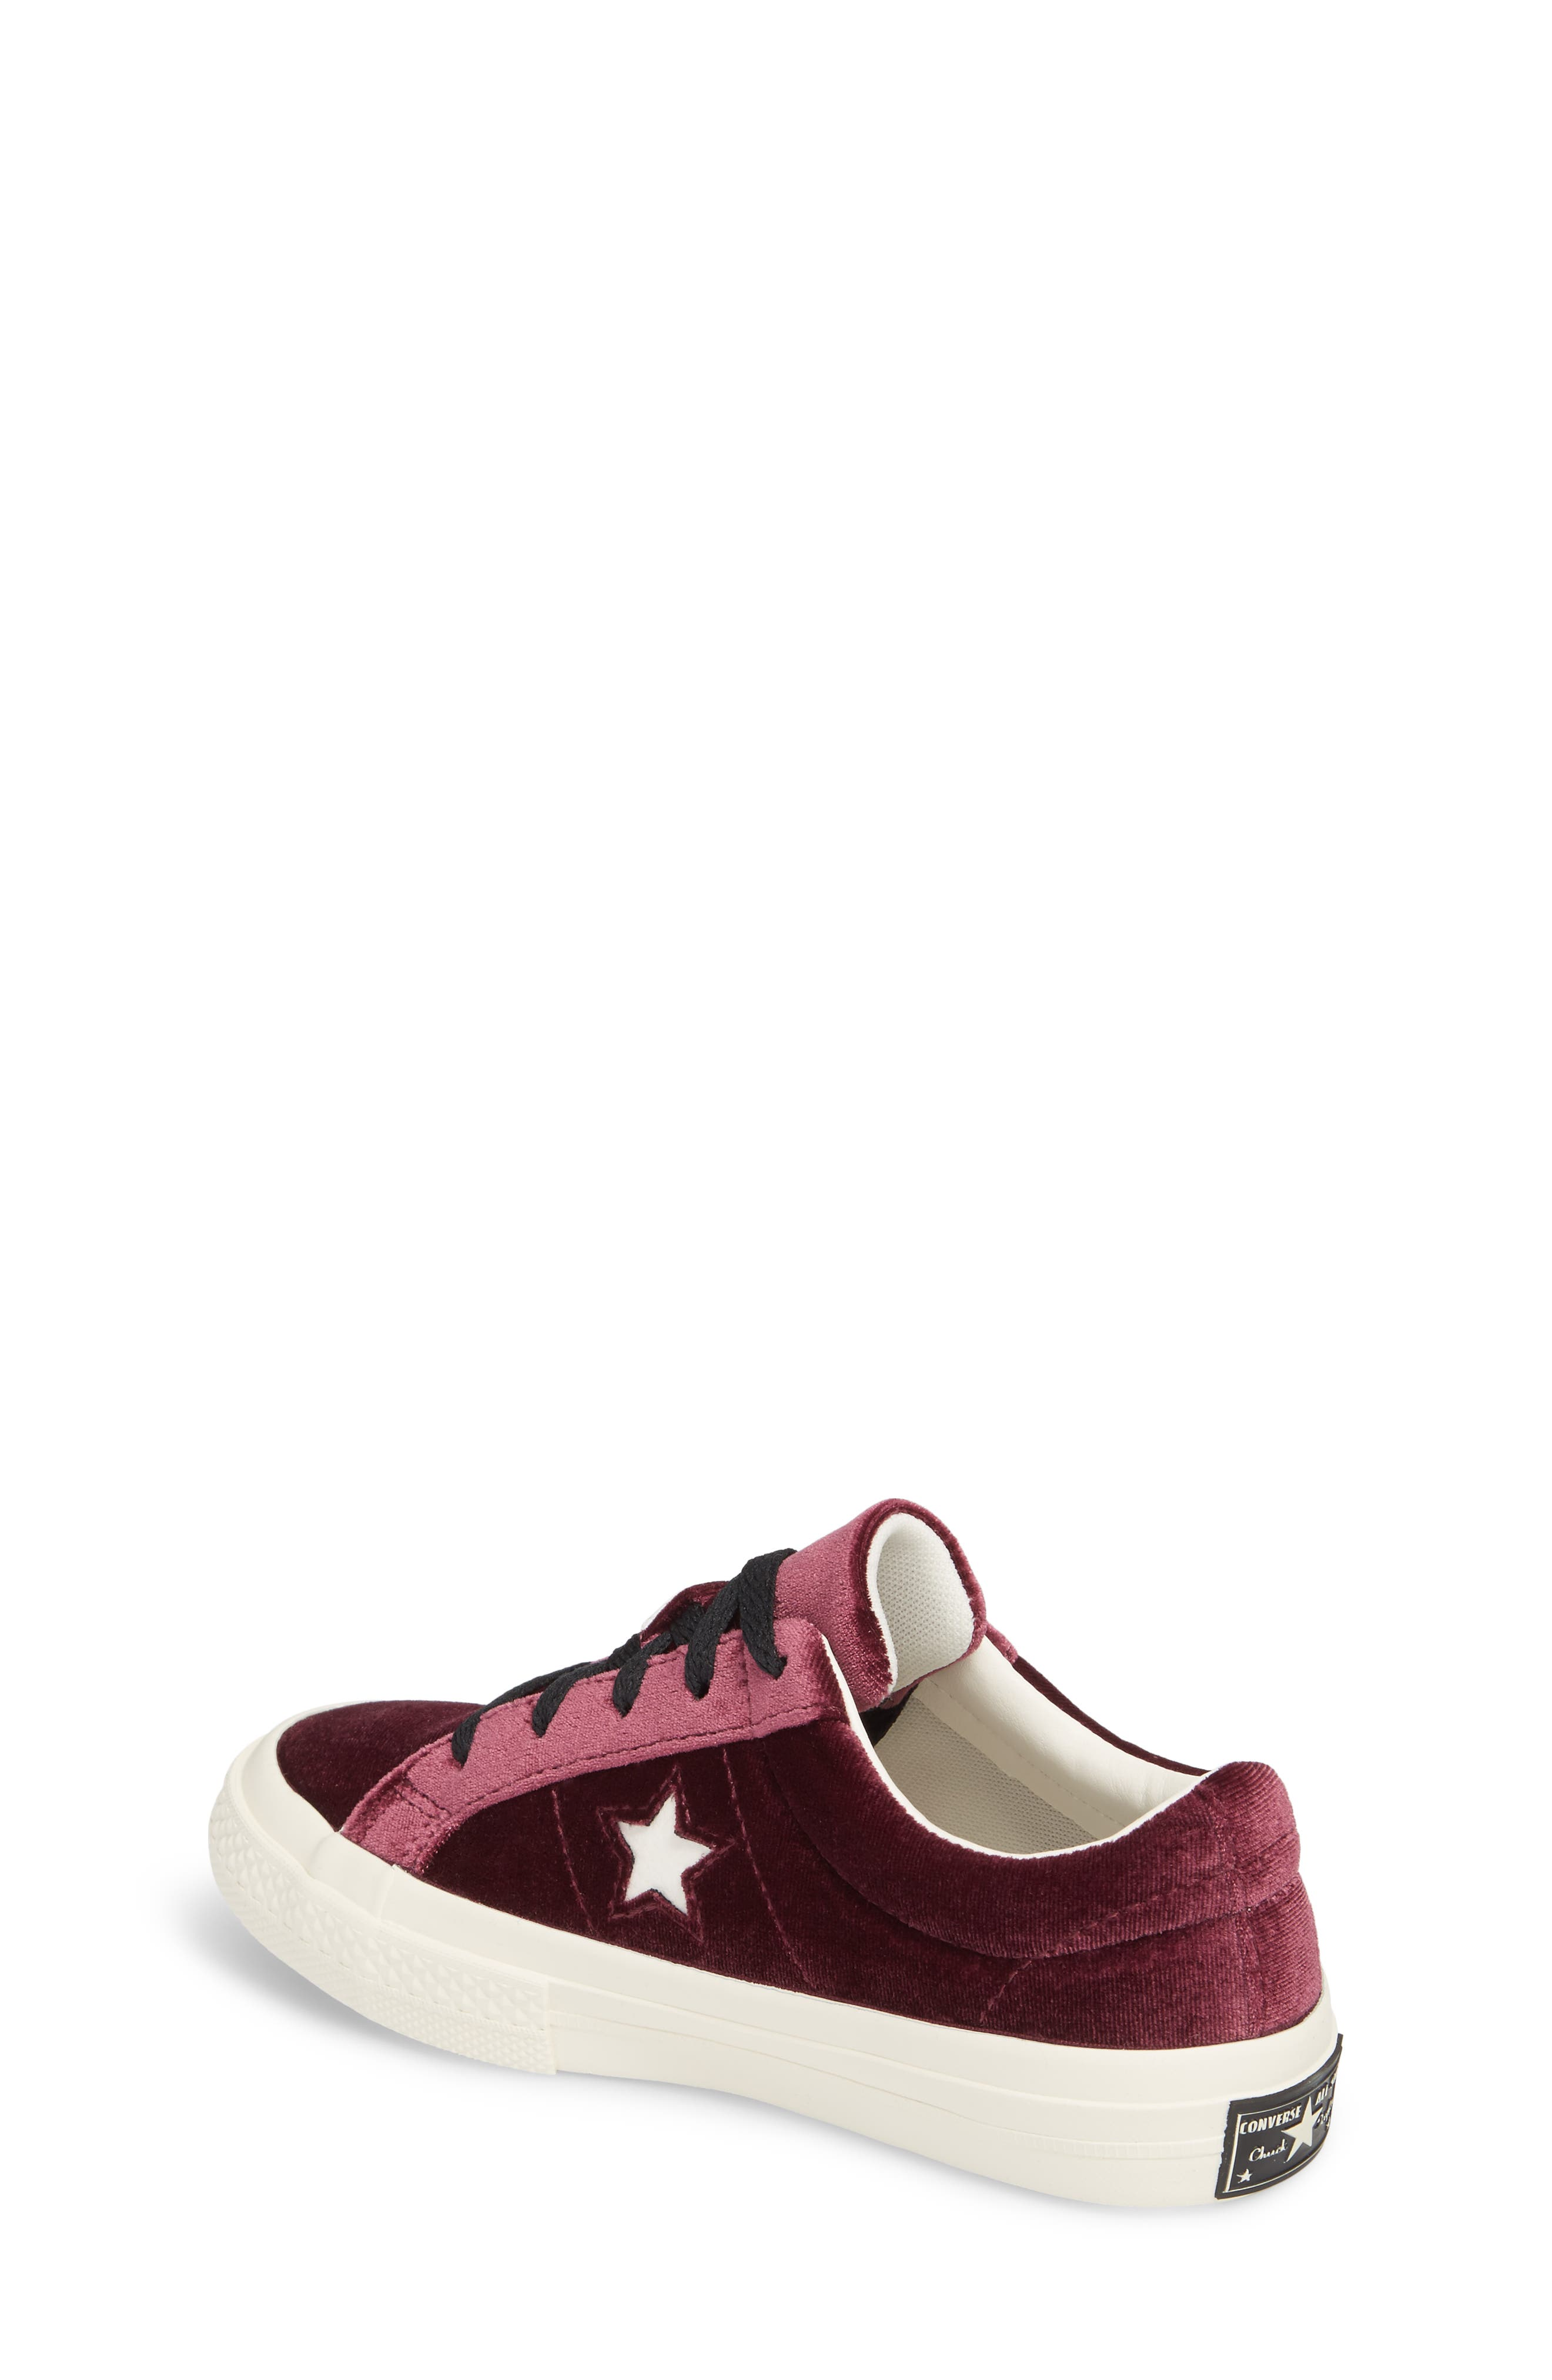 Alternate Image 2  - Converse Chuck Taylor® All Star® One Star Velvet Platform Sneaker (Toddler, Little Kid & Big Kid)